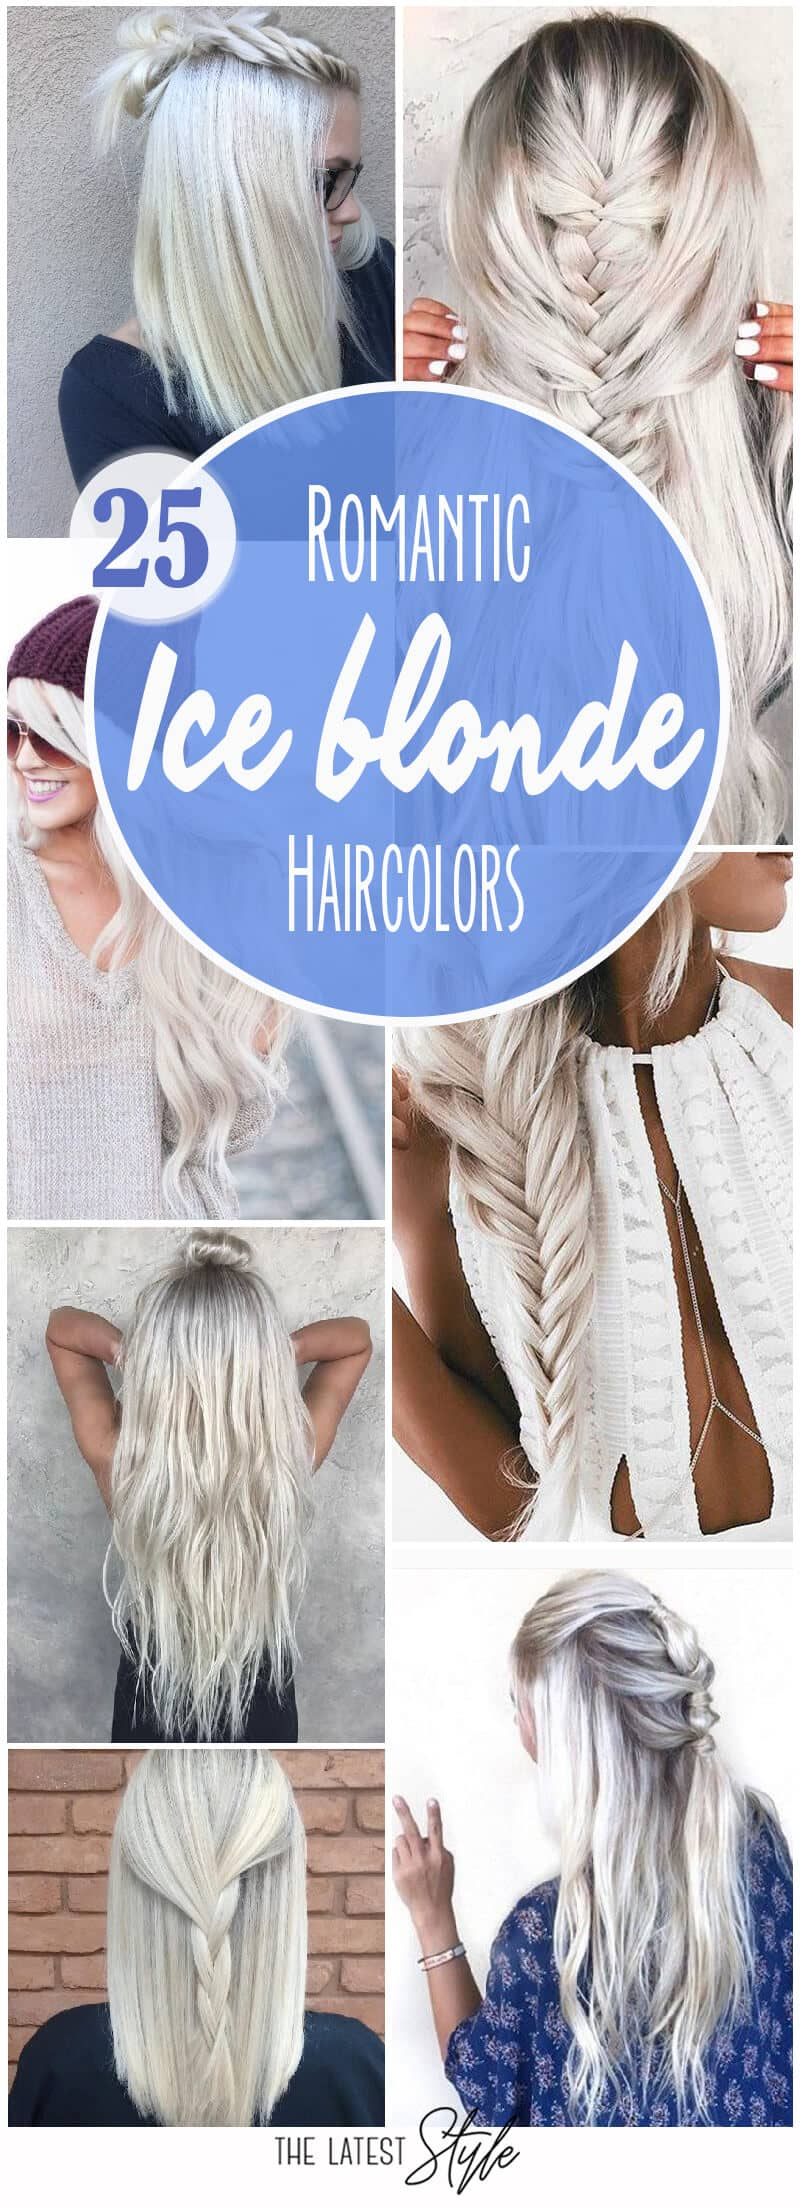 25 Romantic Ice Blonde Haircolors for Real-Life Elsas